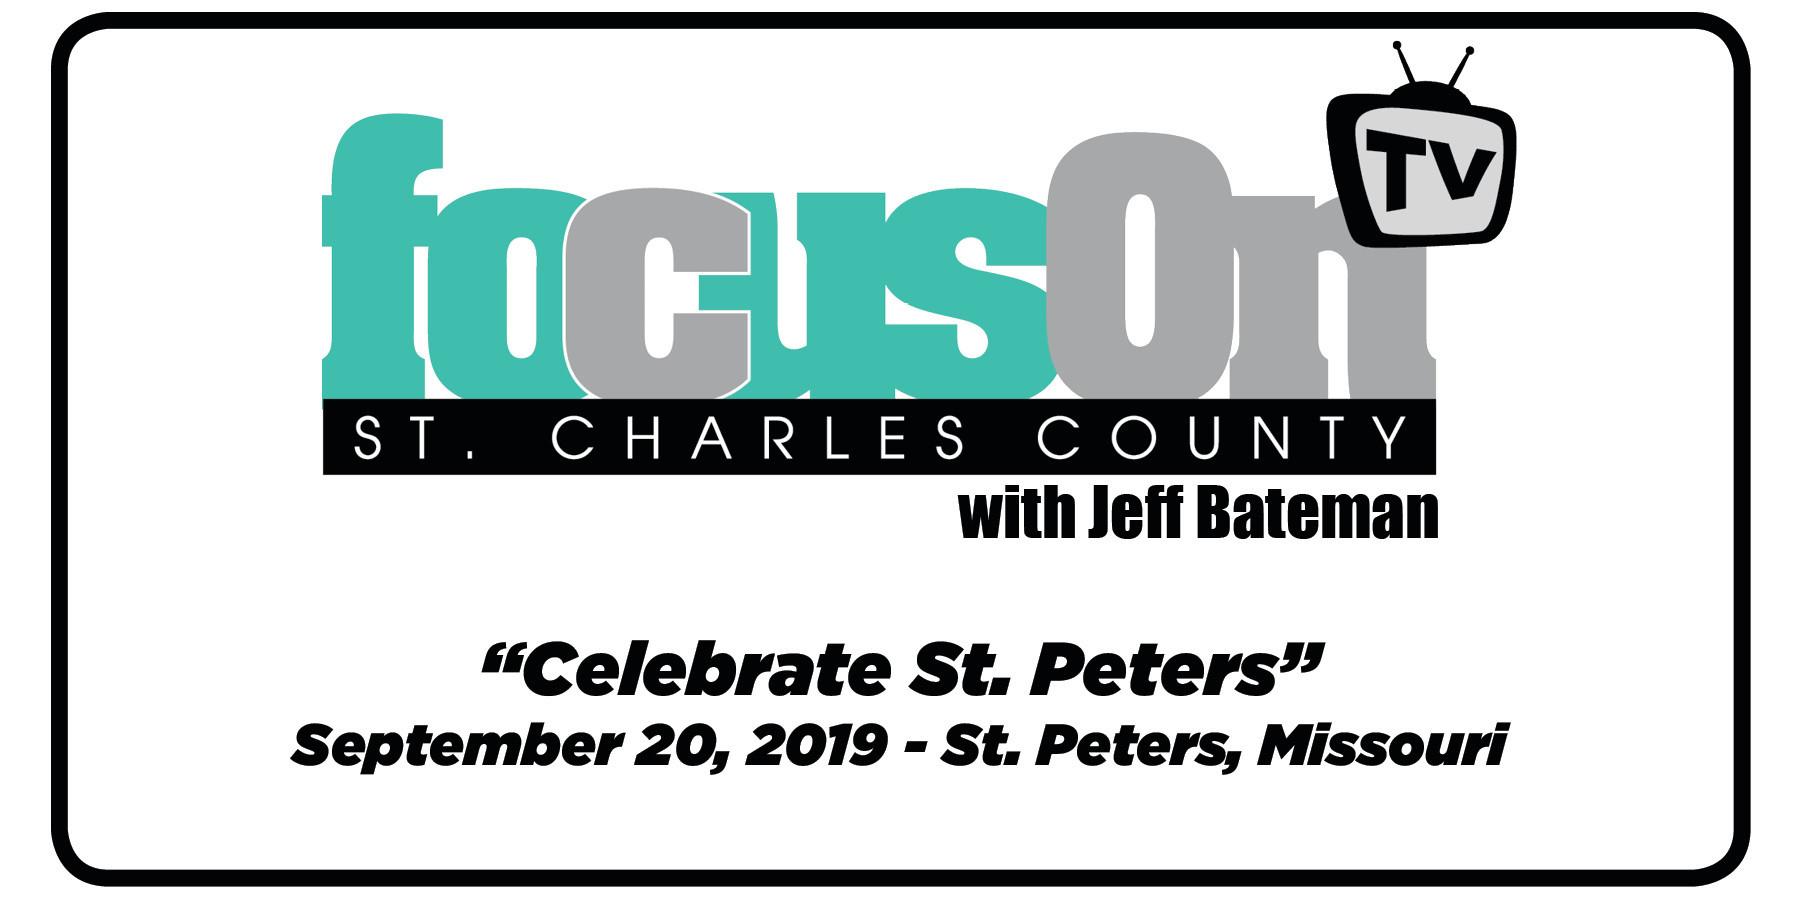 Celebrate St. Peters - Lakeside 370